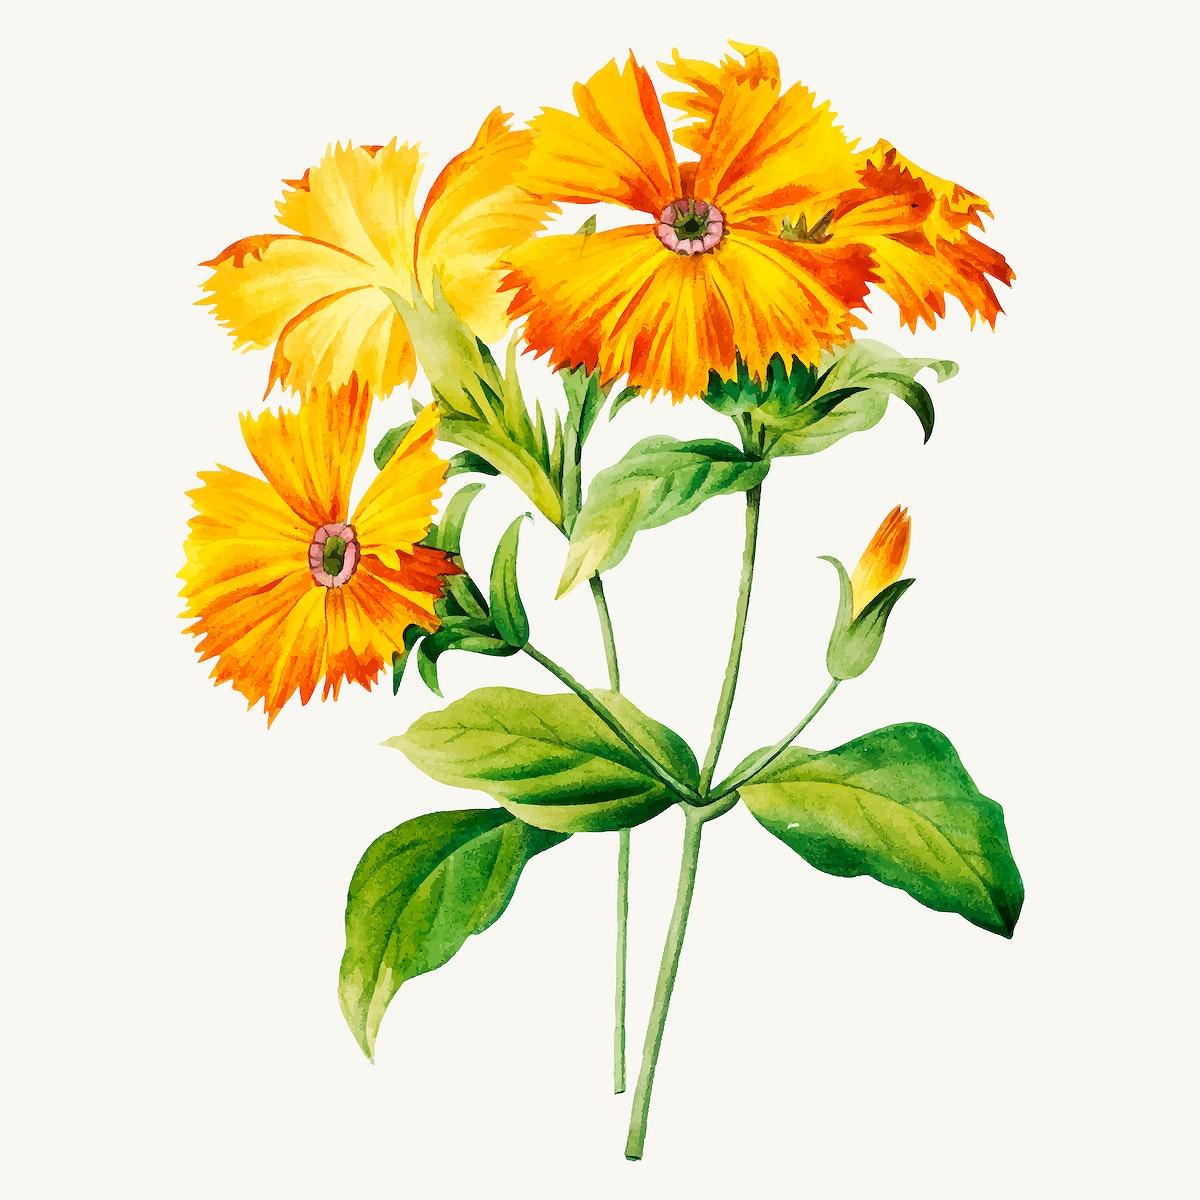 Lychnis grandiflora flower vector, remixed from artworks by Pierre-Joseph Redouté